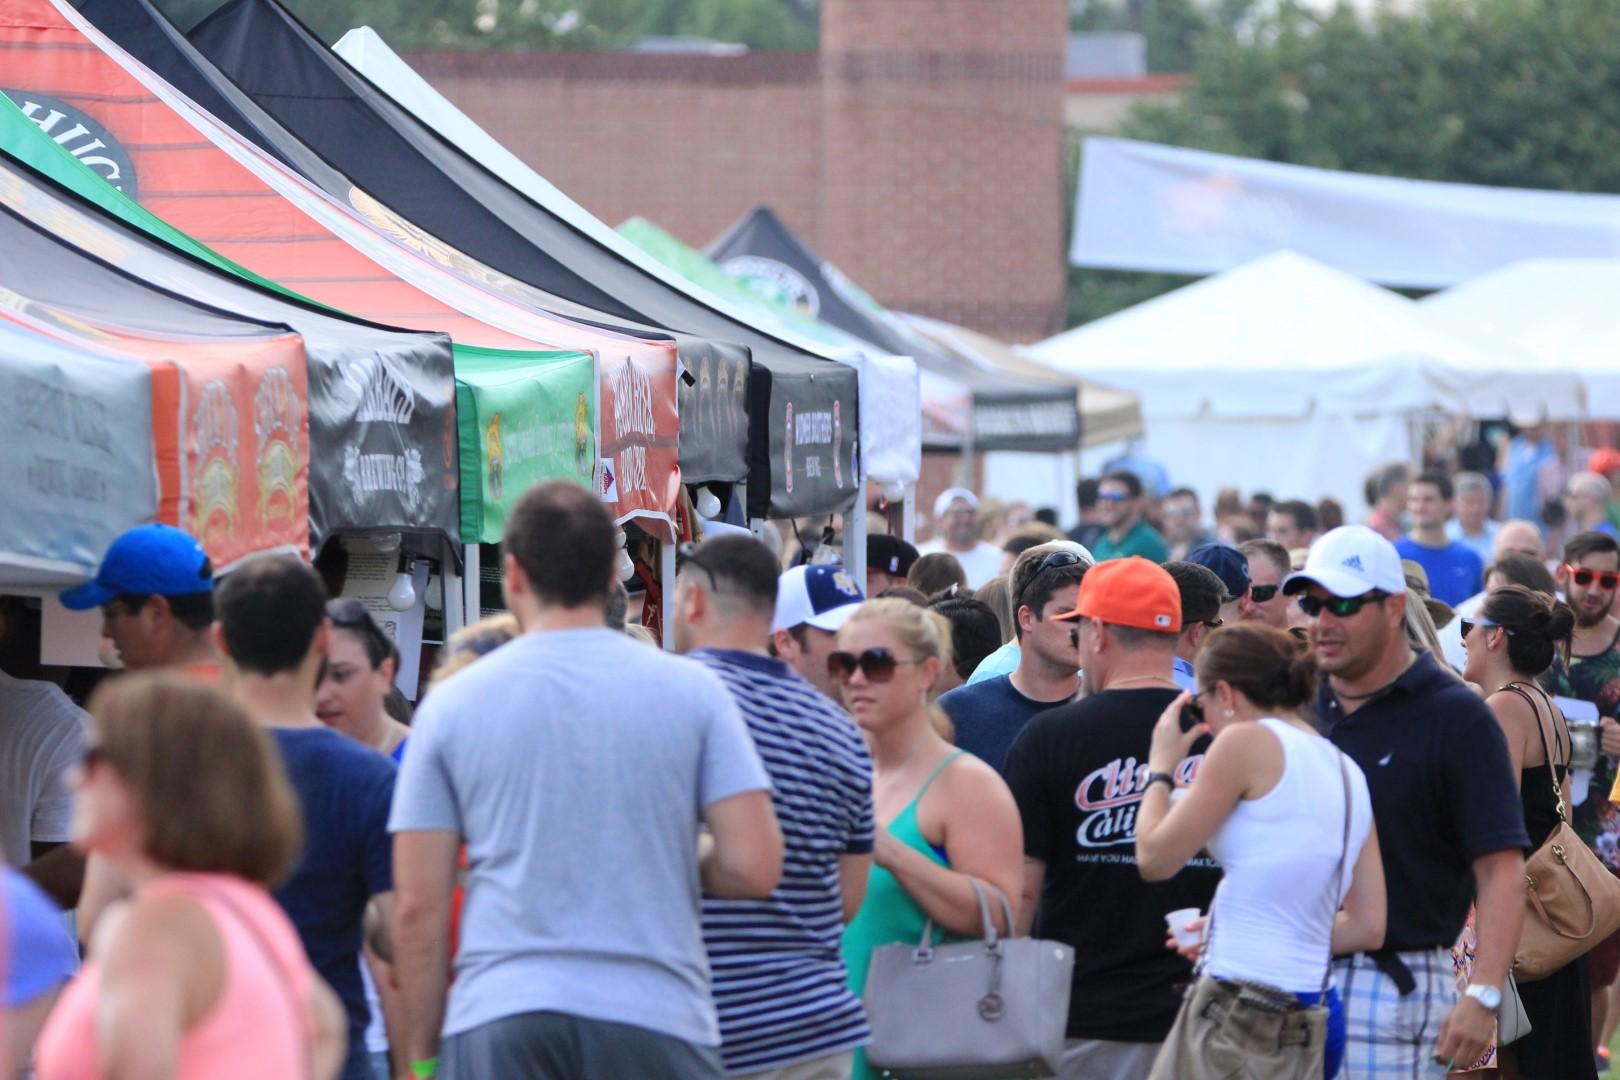 The Woodlands Craft Beer Festival